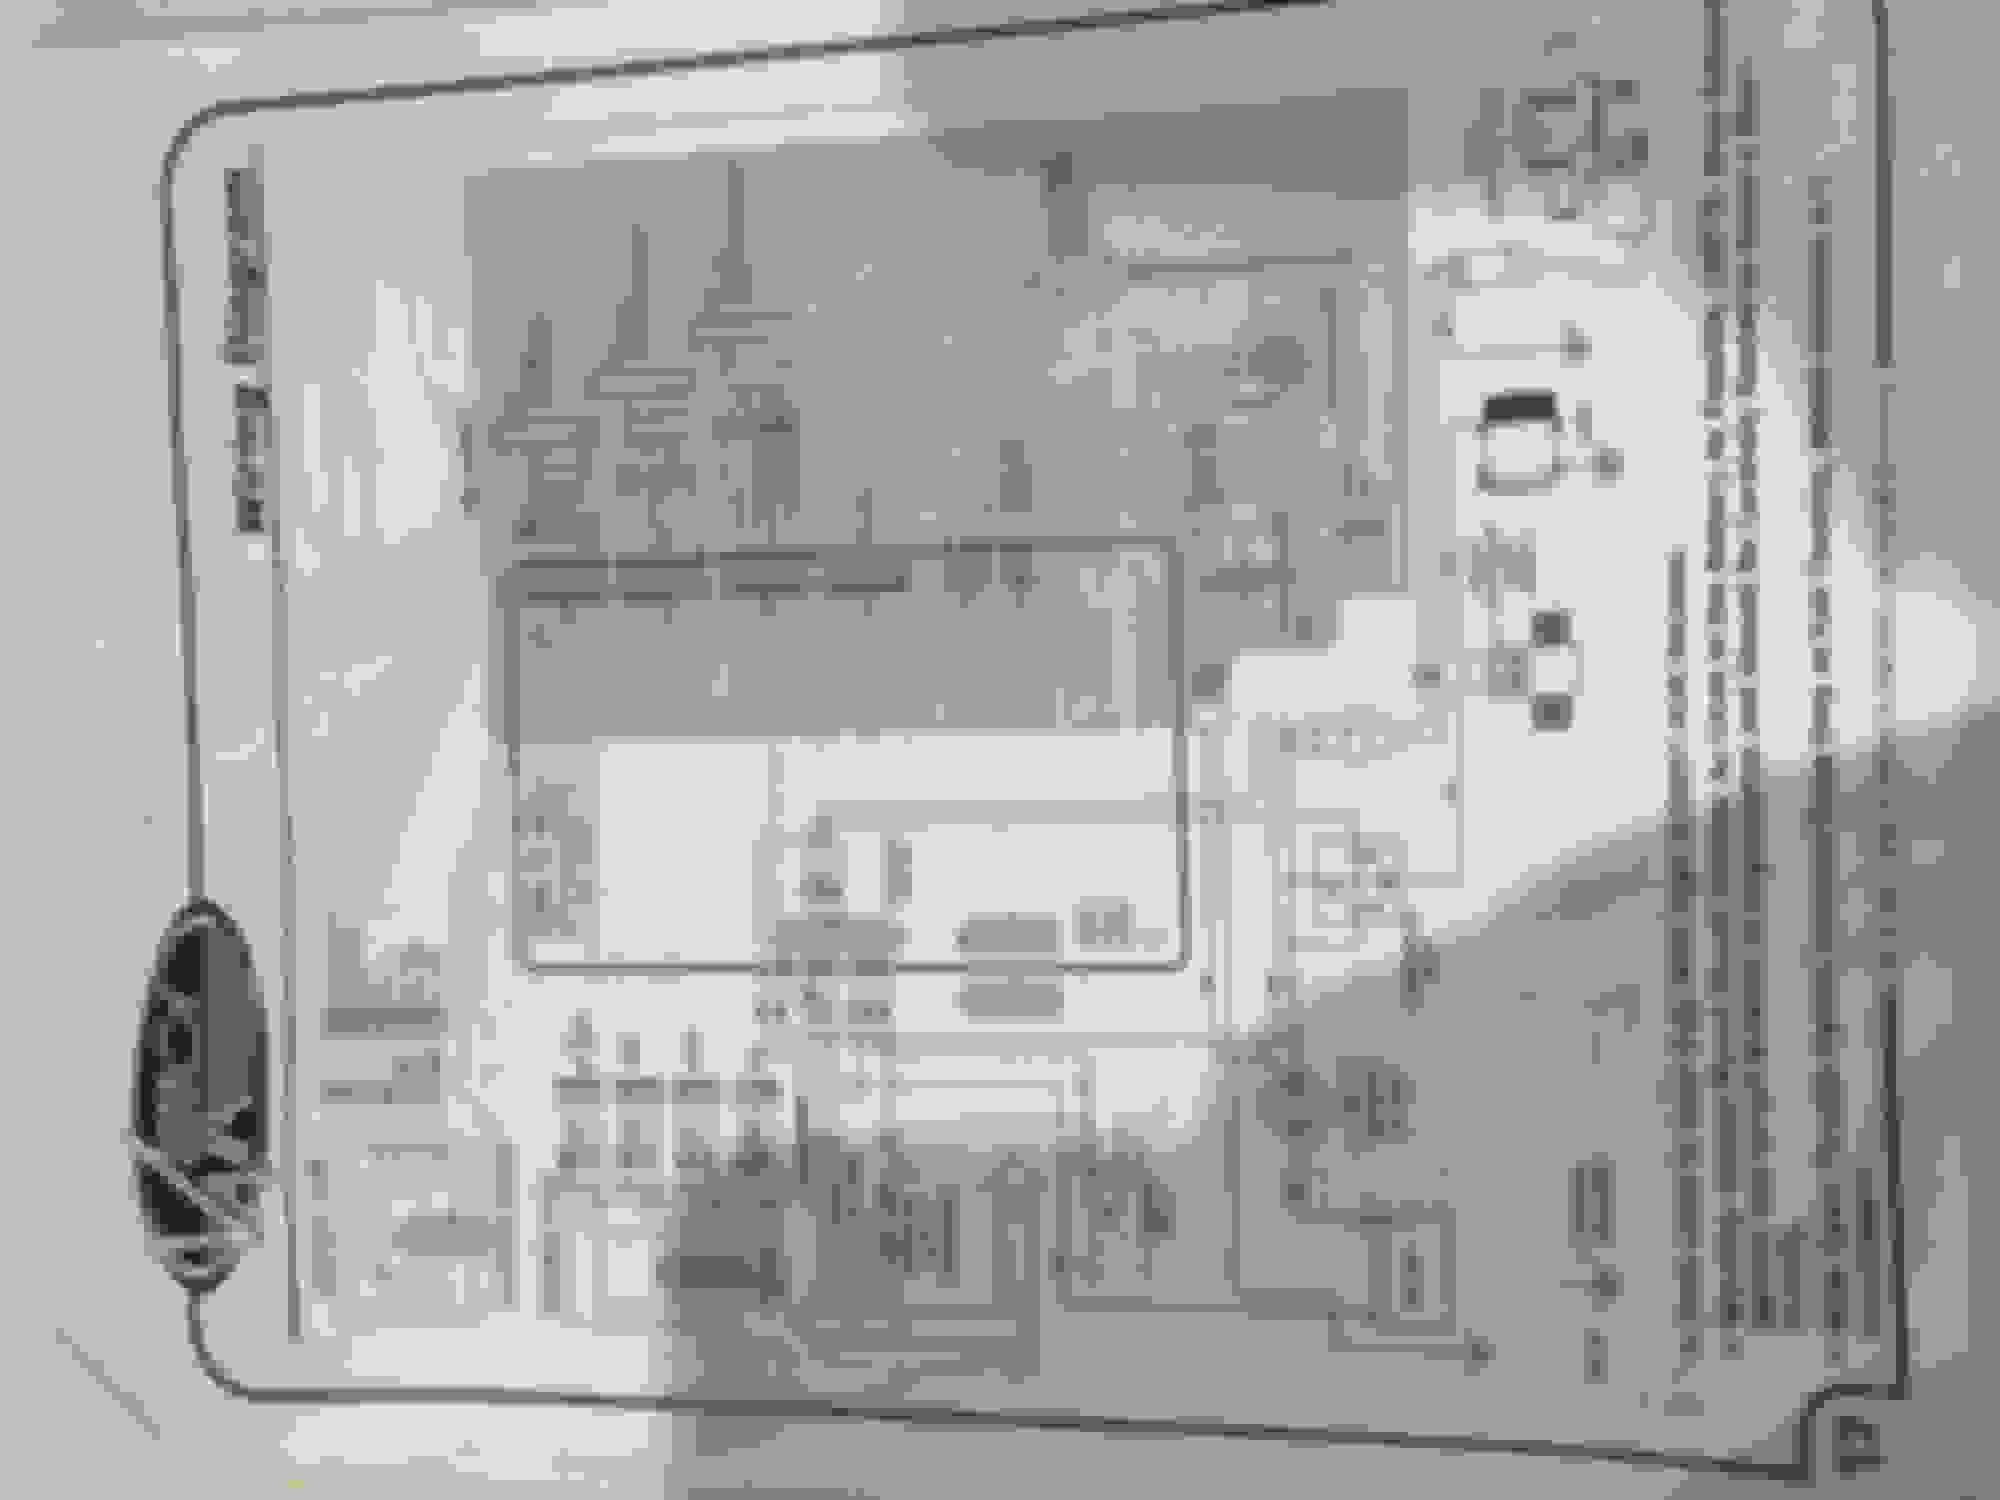 LS1 fan wiring with vintage air troubleshooting newb ... Dakota Digital Wiring Schematics Vitage Air on